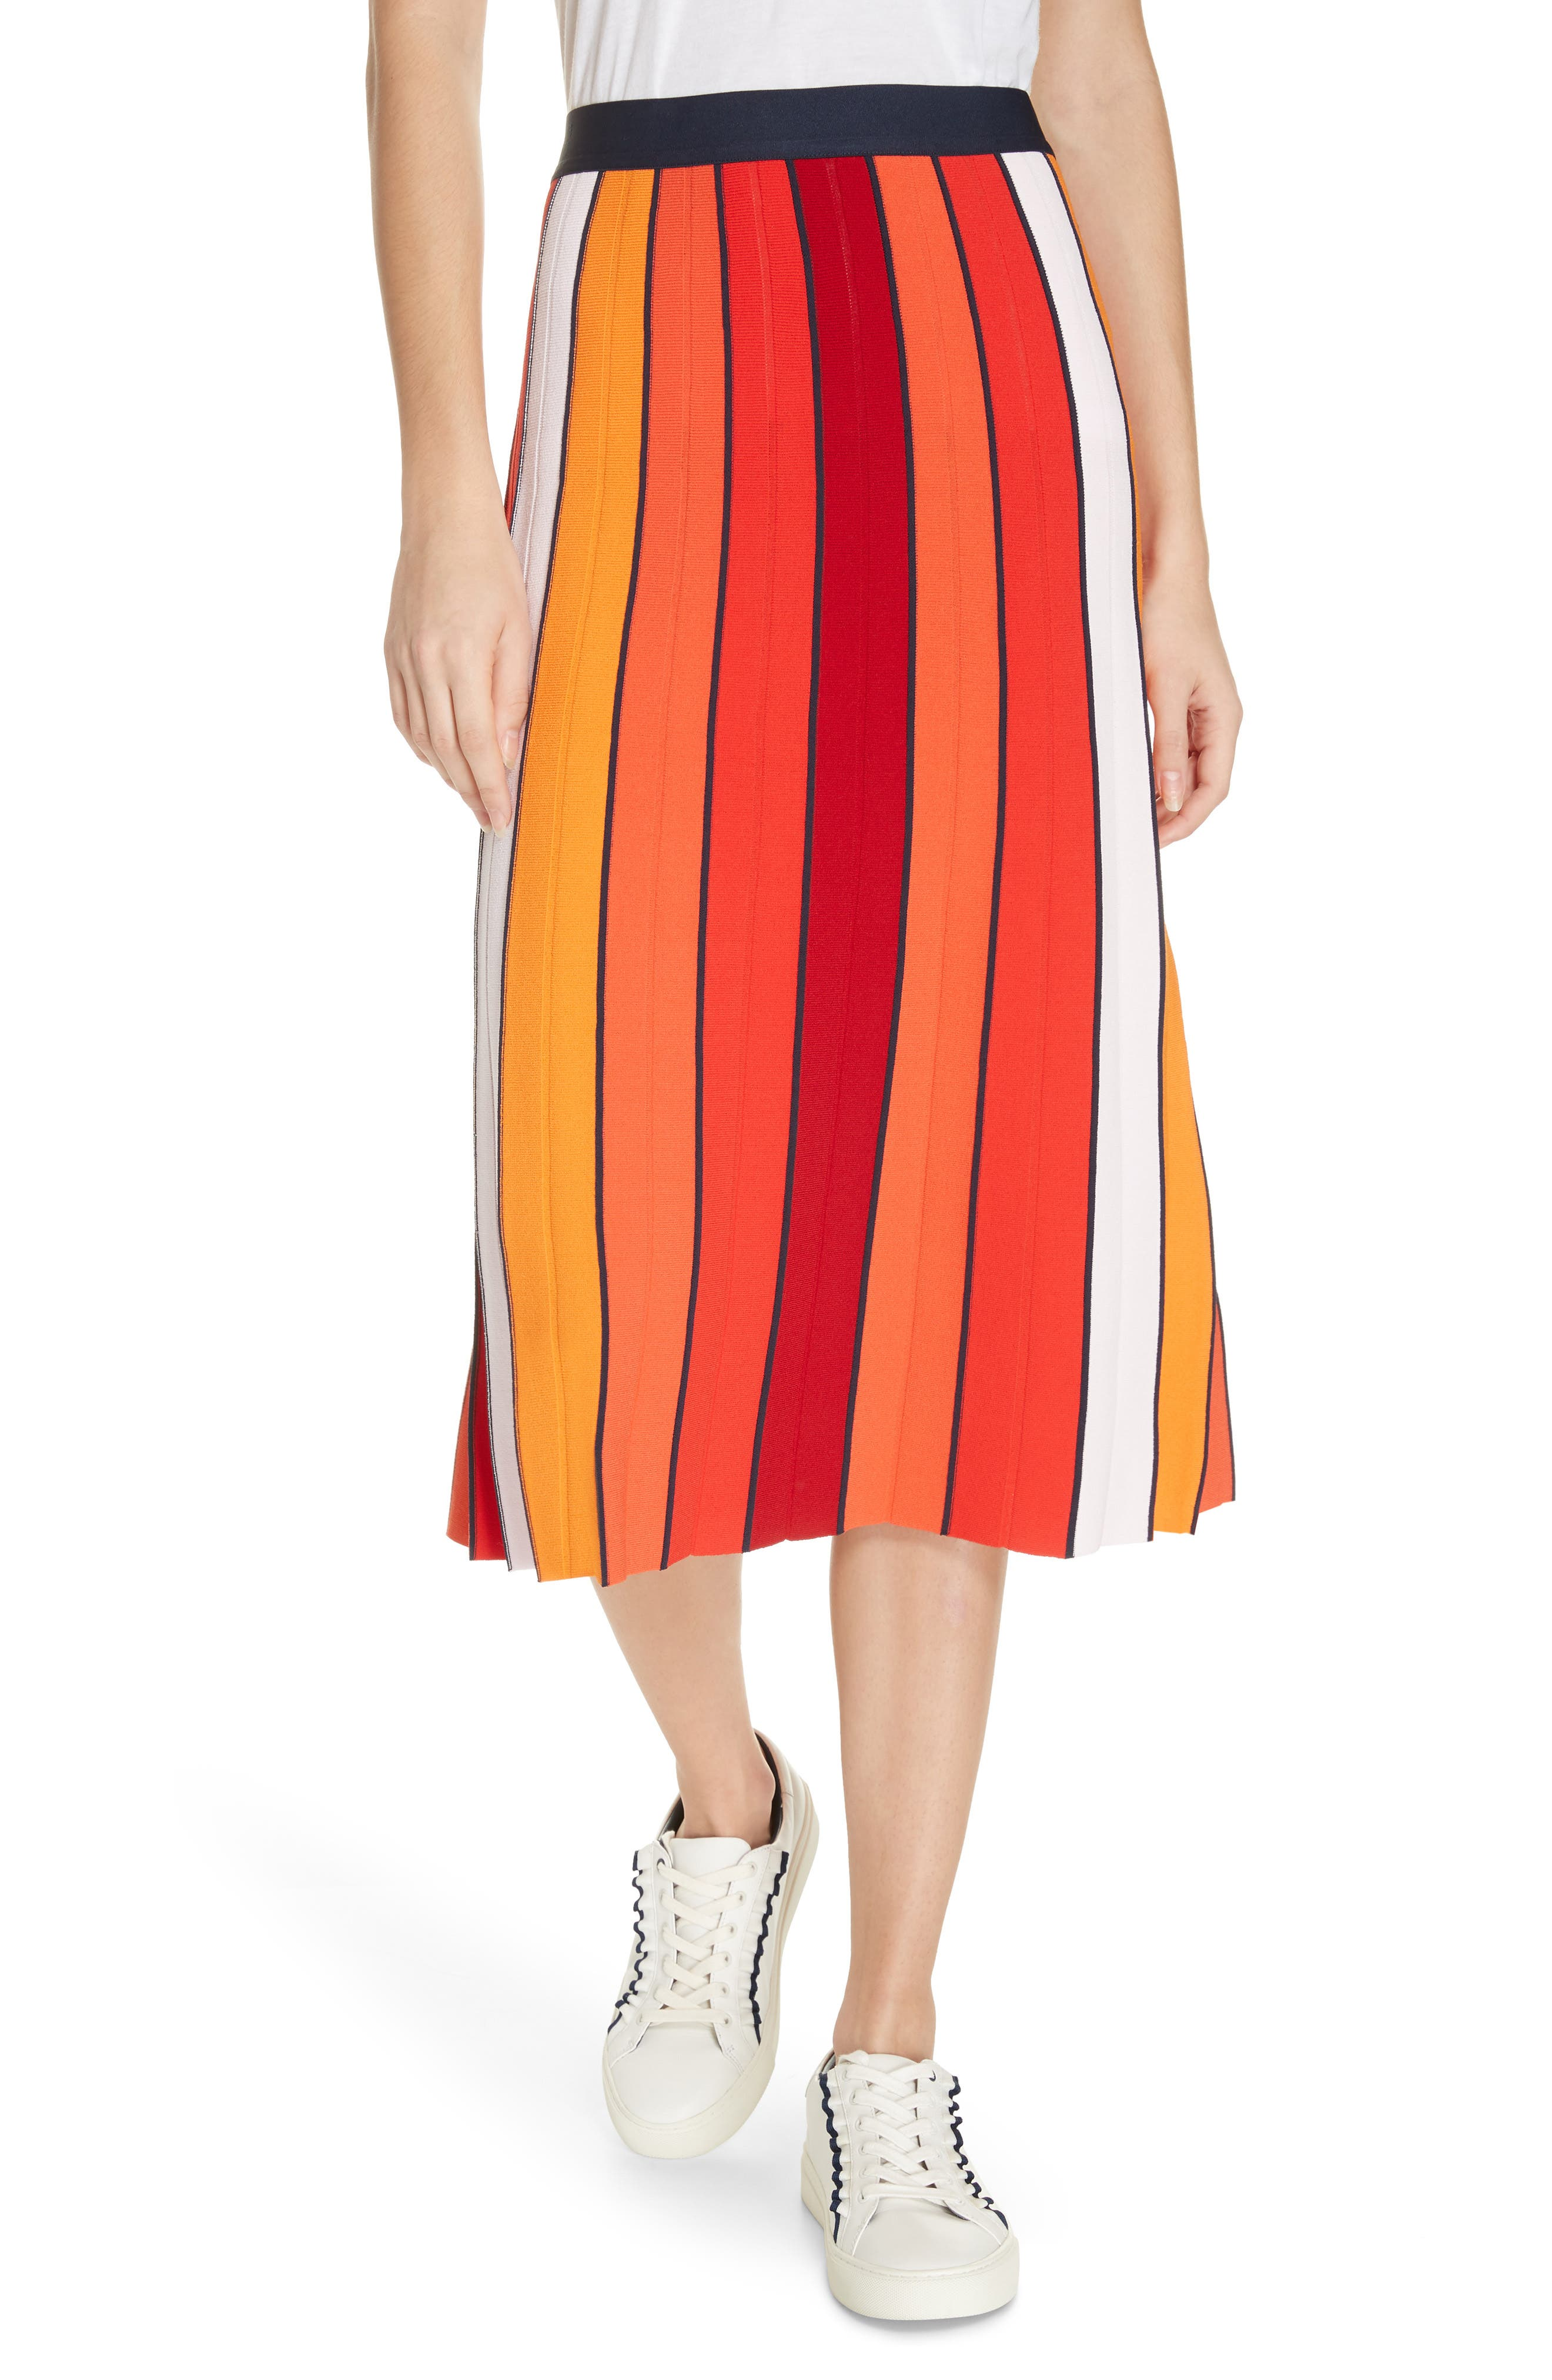 60s Skirts | 70s Hippie Skirts, Jumper Dresses Womens Tory Sport Stripe Tech Knit Skirt Size Small - Red $99.20 AT vintagedancer.com